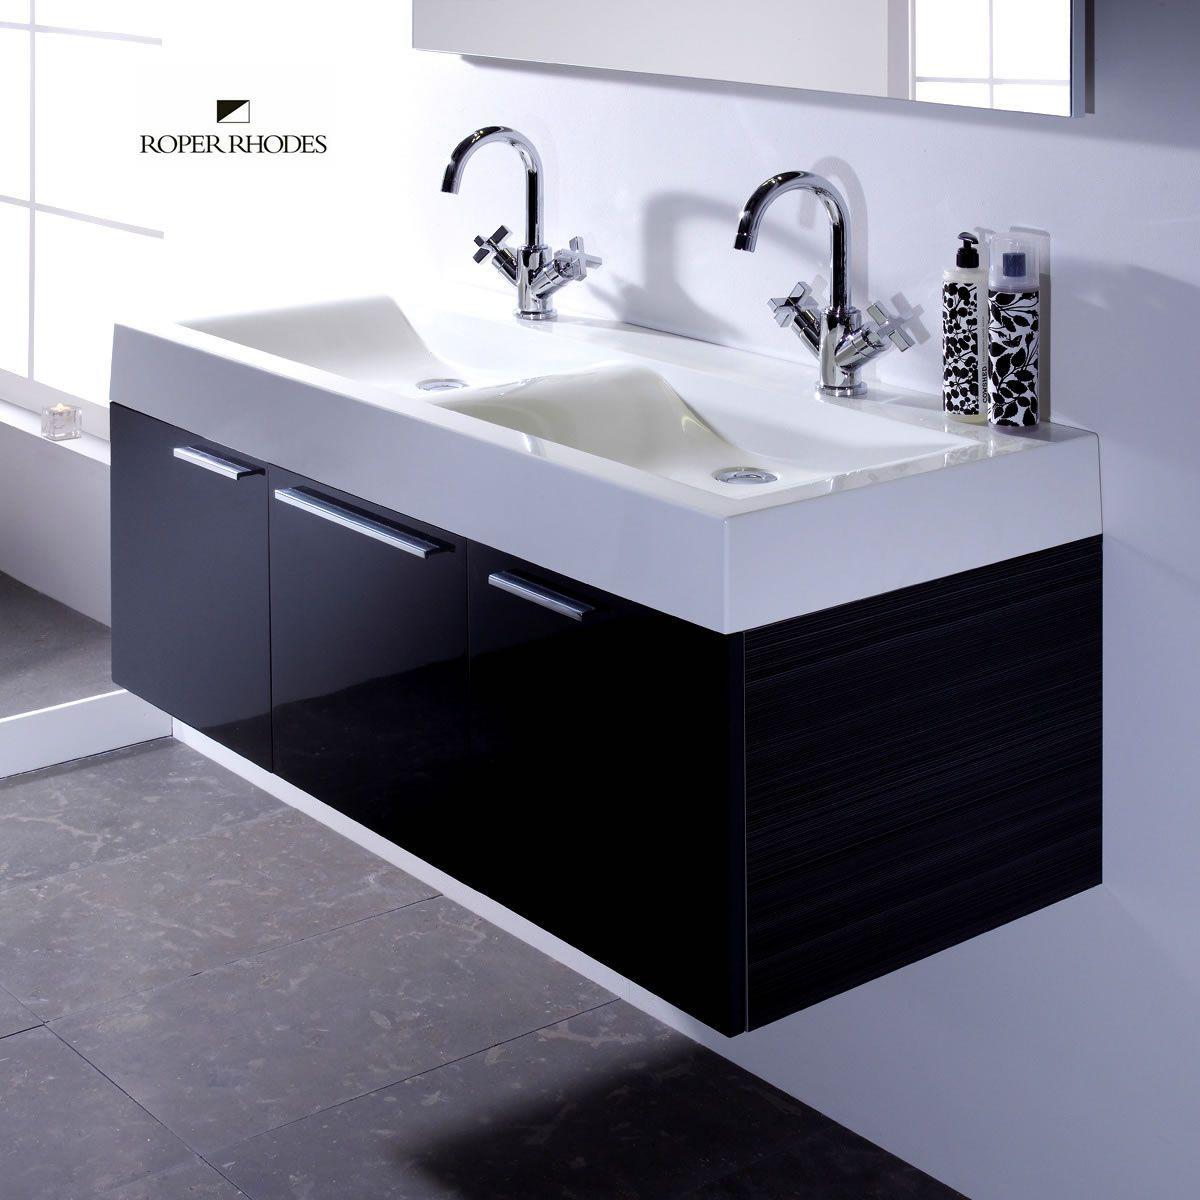 Bathroom Sinks Uk Cheap roper rhodes envy 1200mm wall hung unit with twin basins £857